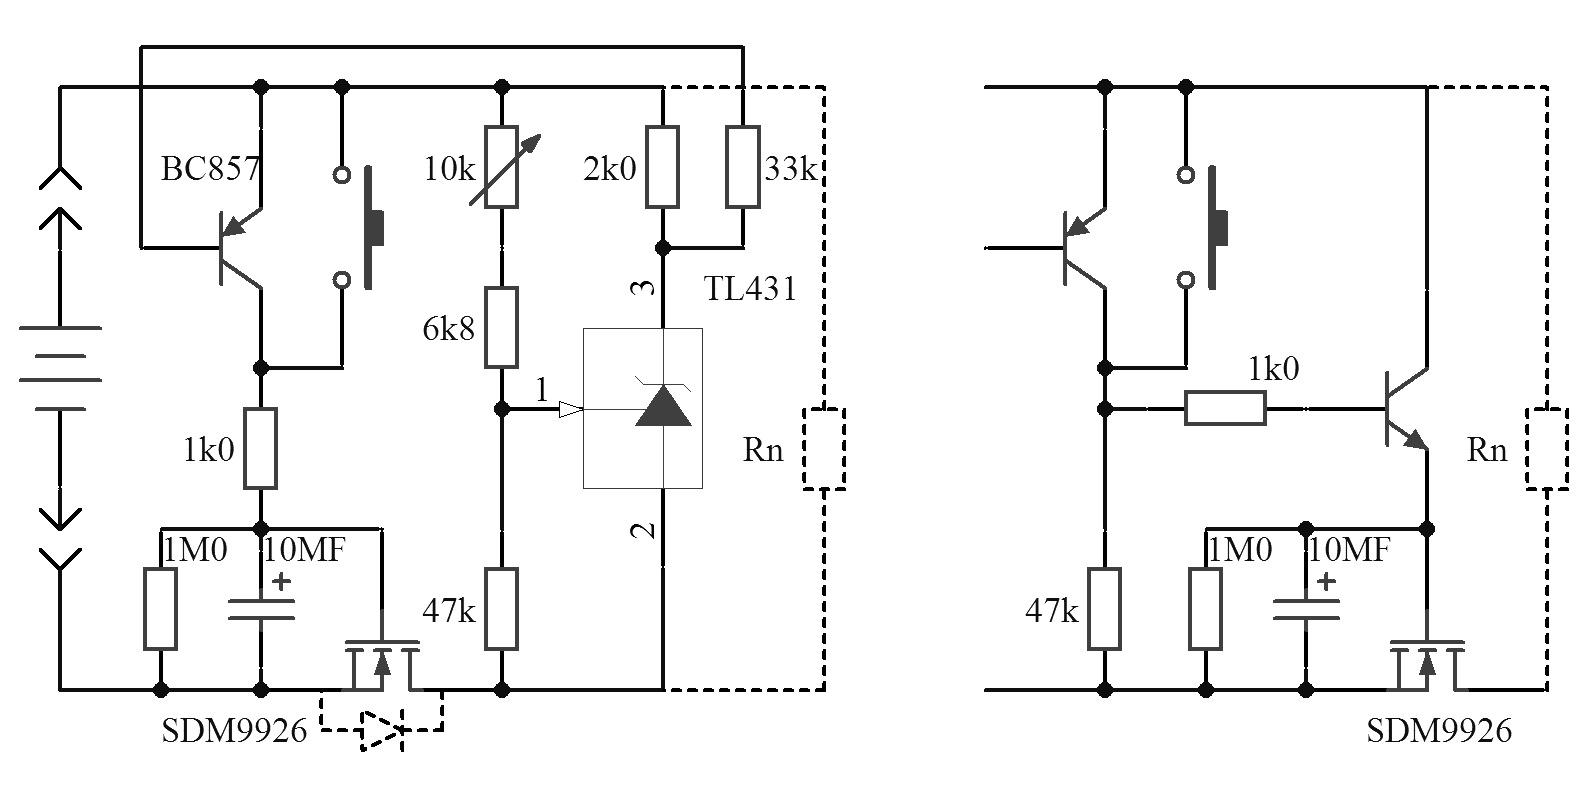 схема подключения аккумулятора к лягушки